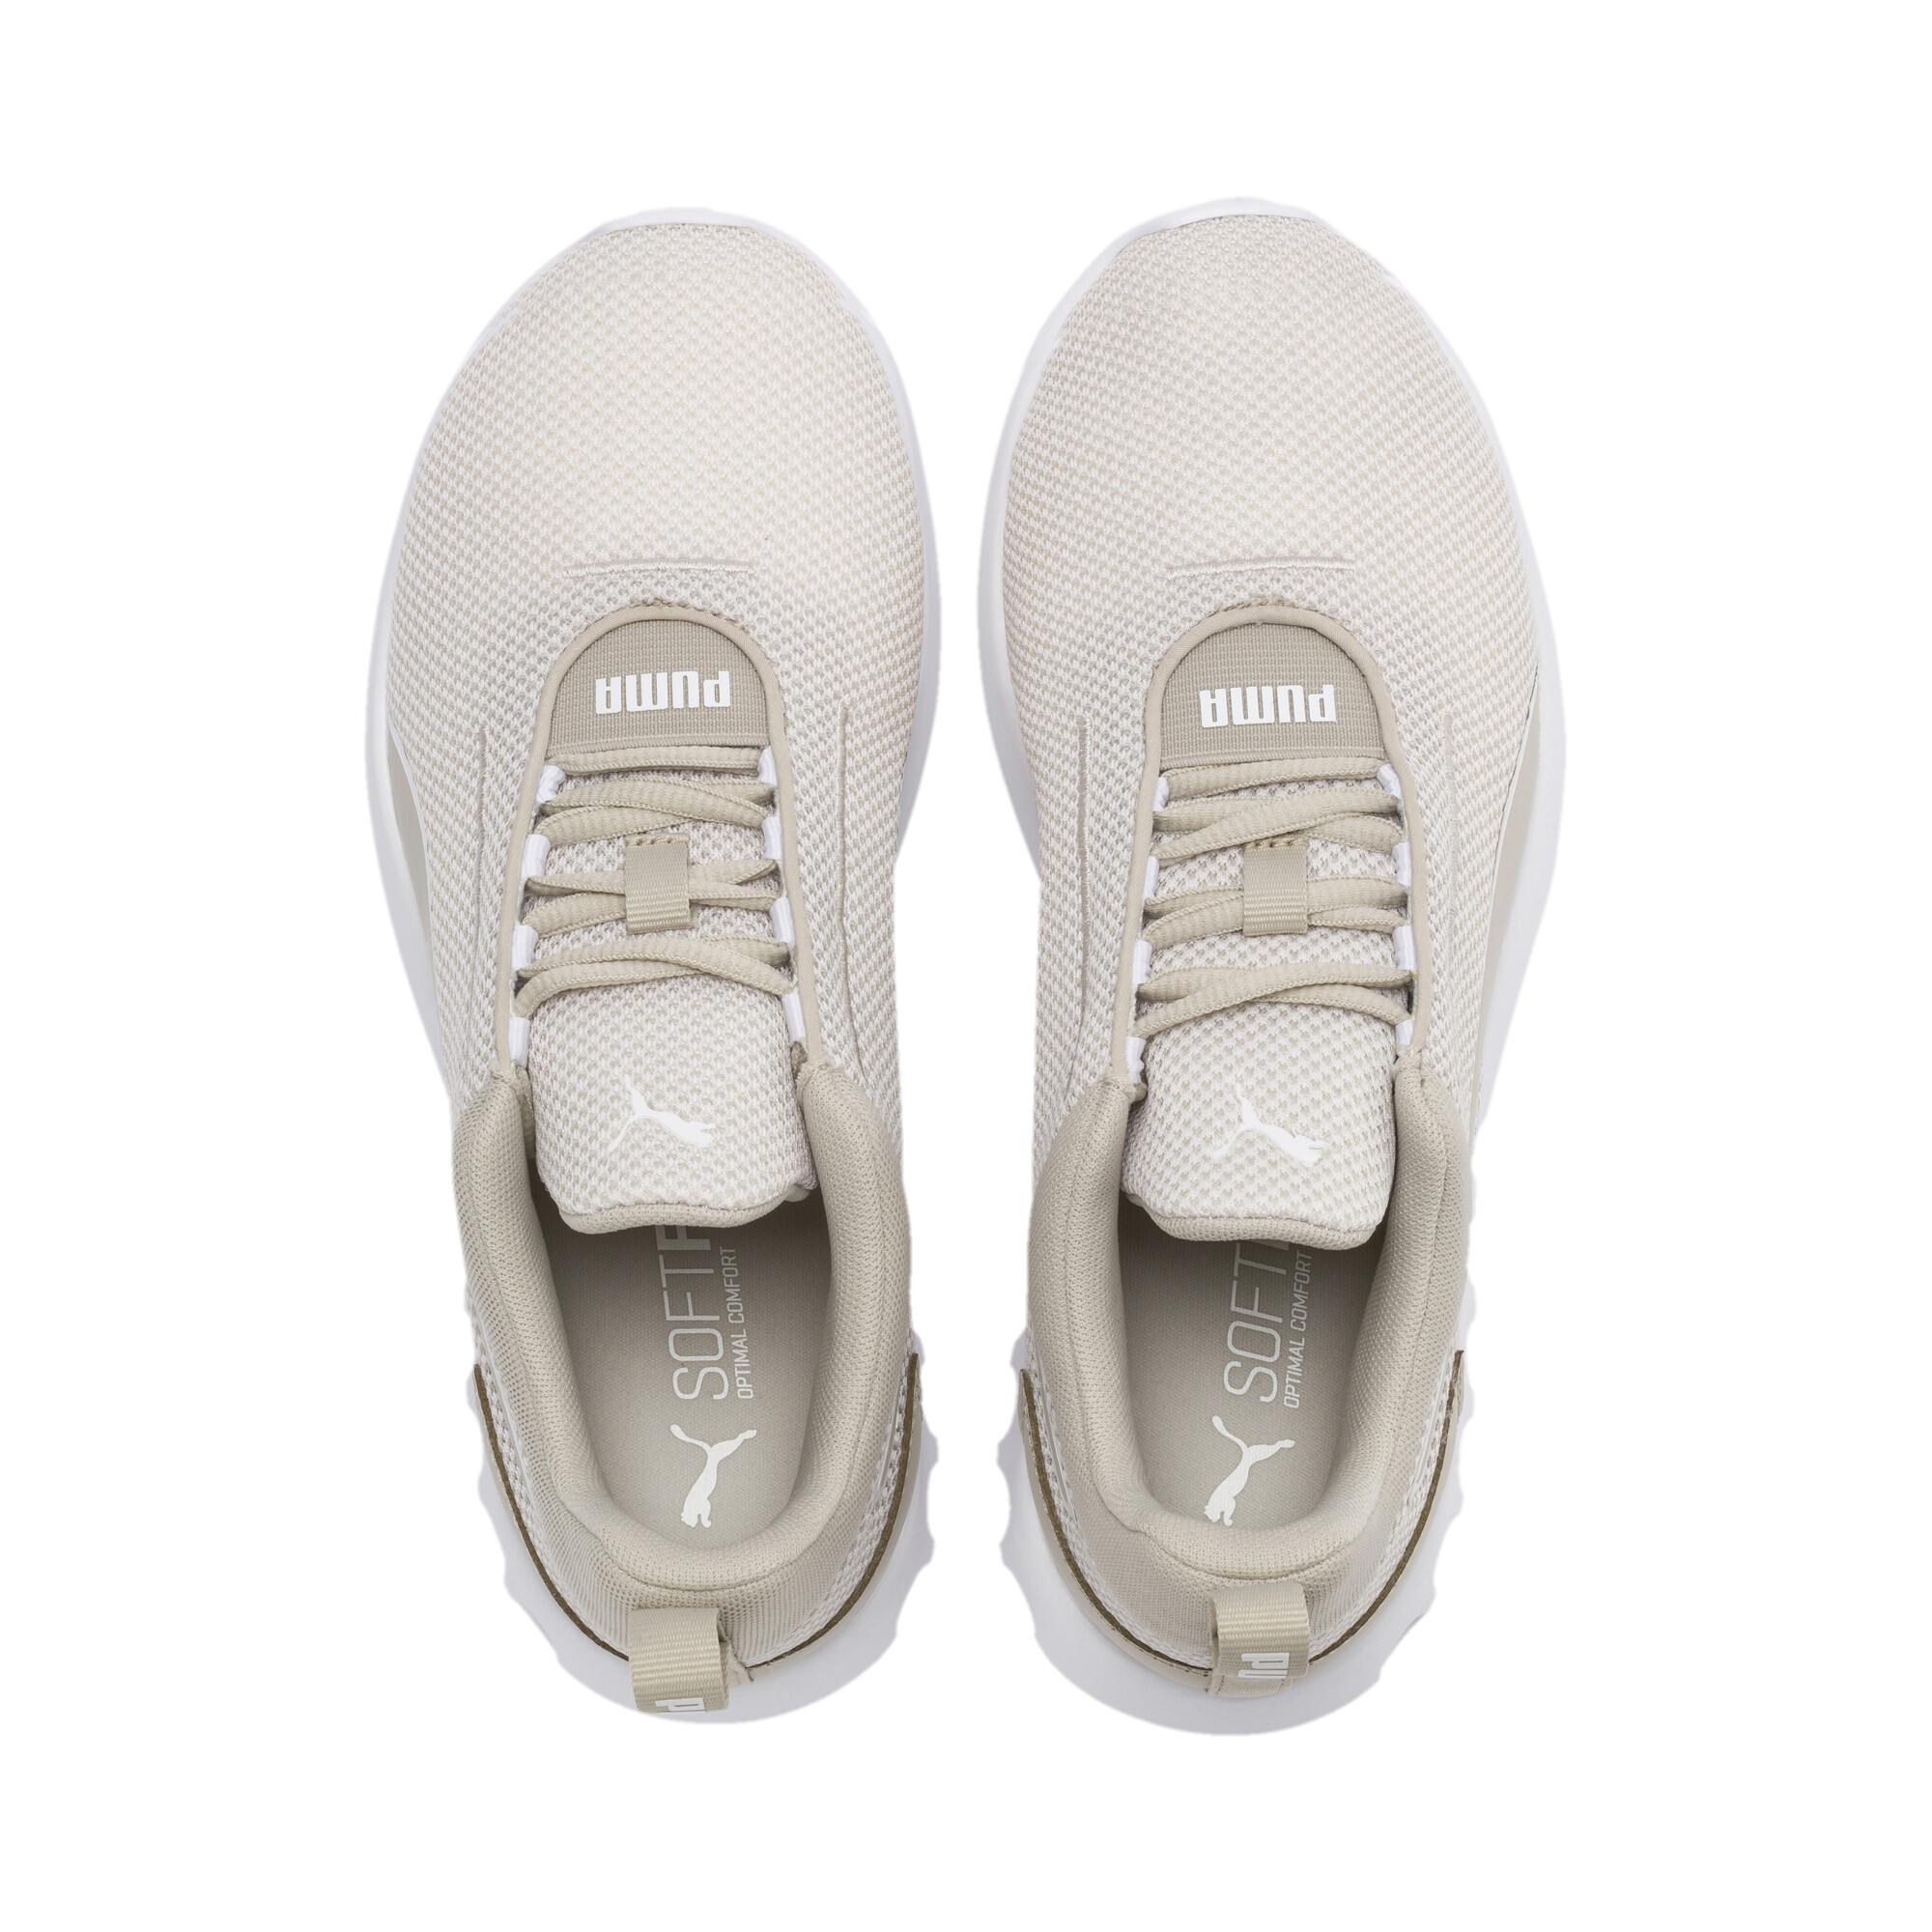 PUMA-Carson-2-Concave-Women-s-Training-Shoes-Women-Shoe-Running thumbnail 7